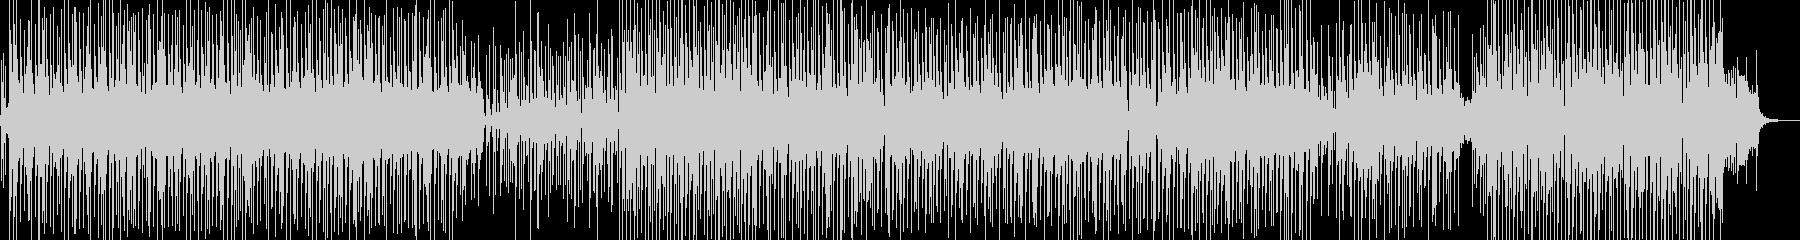 Reggae Pop of Vacation Image c's unreproduced waveform